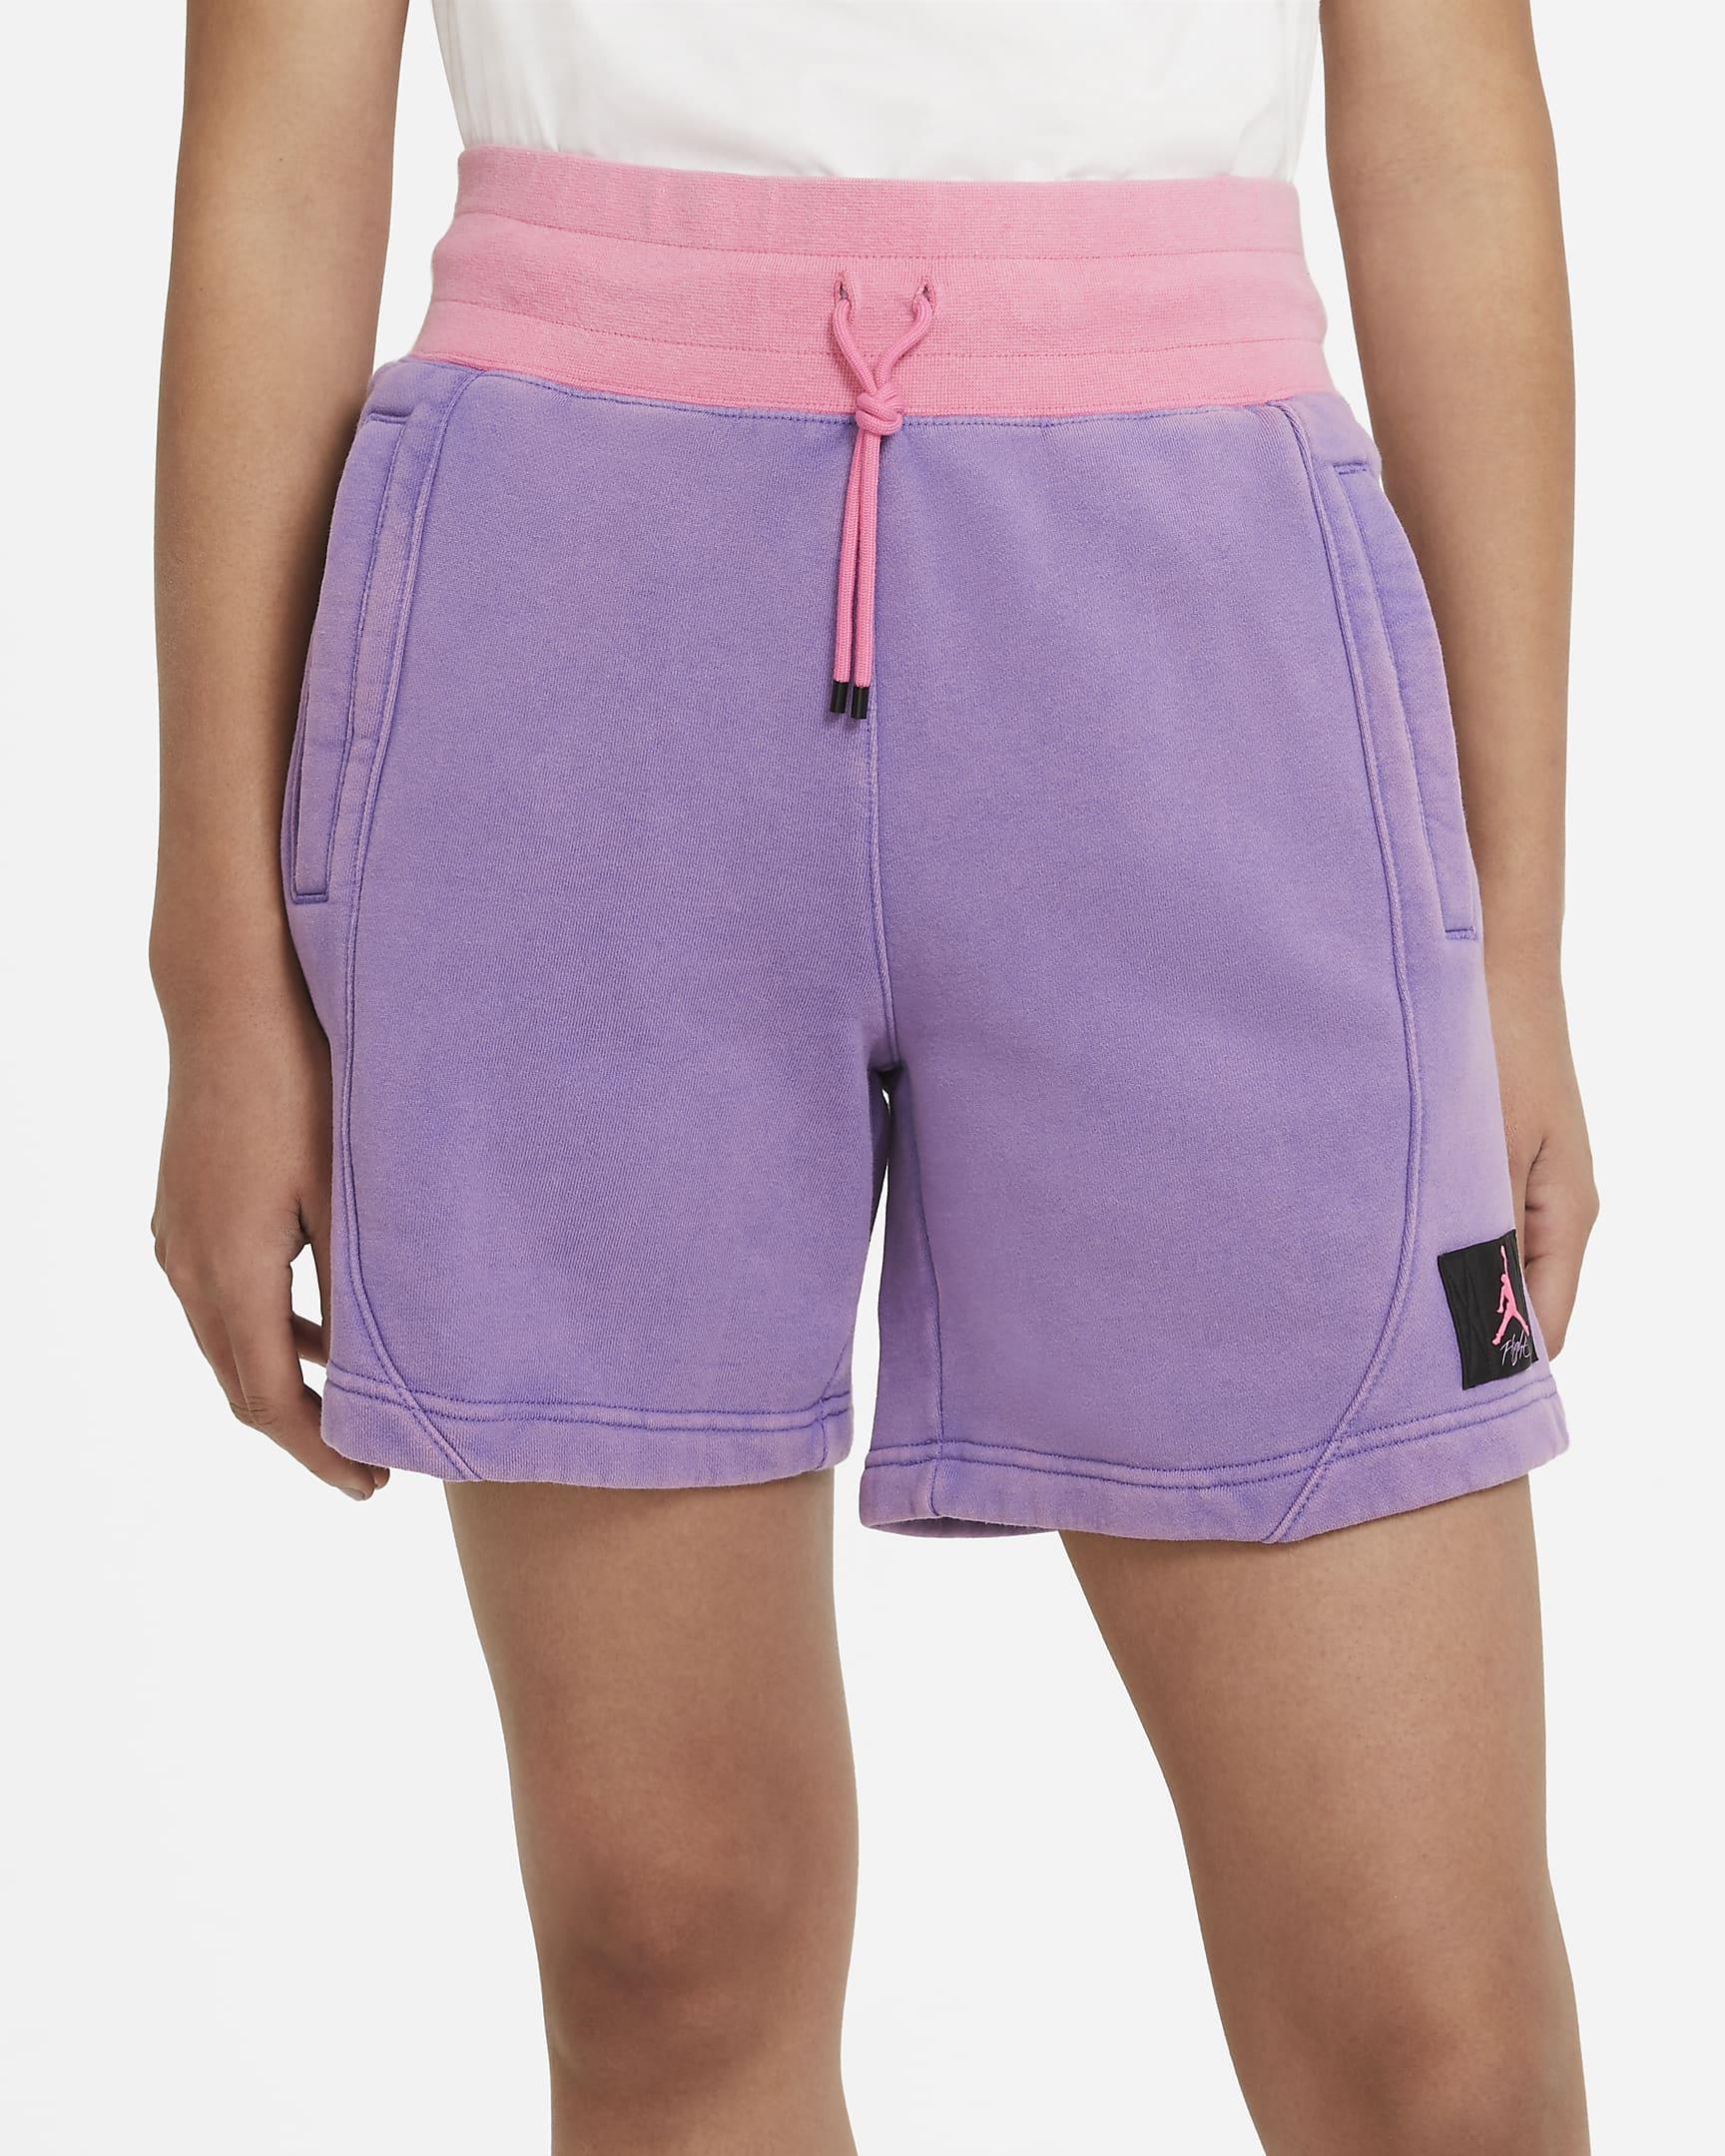 jordan-flight-womens-fleece-shorts-zDGn42-4